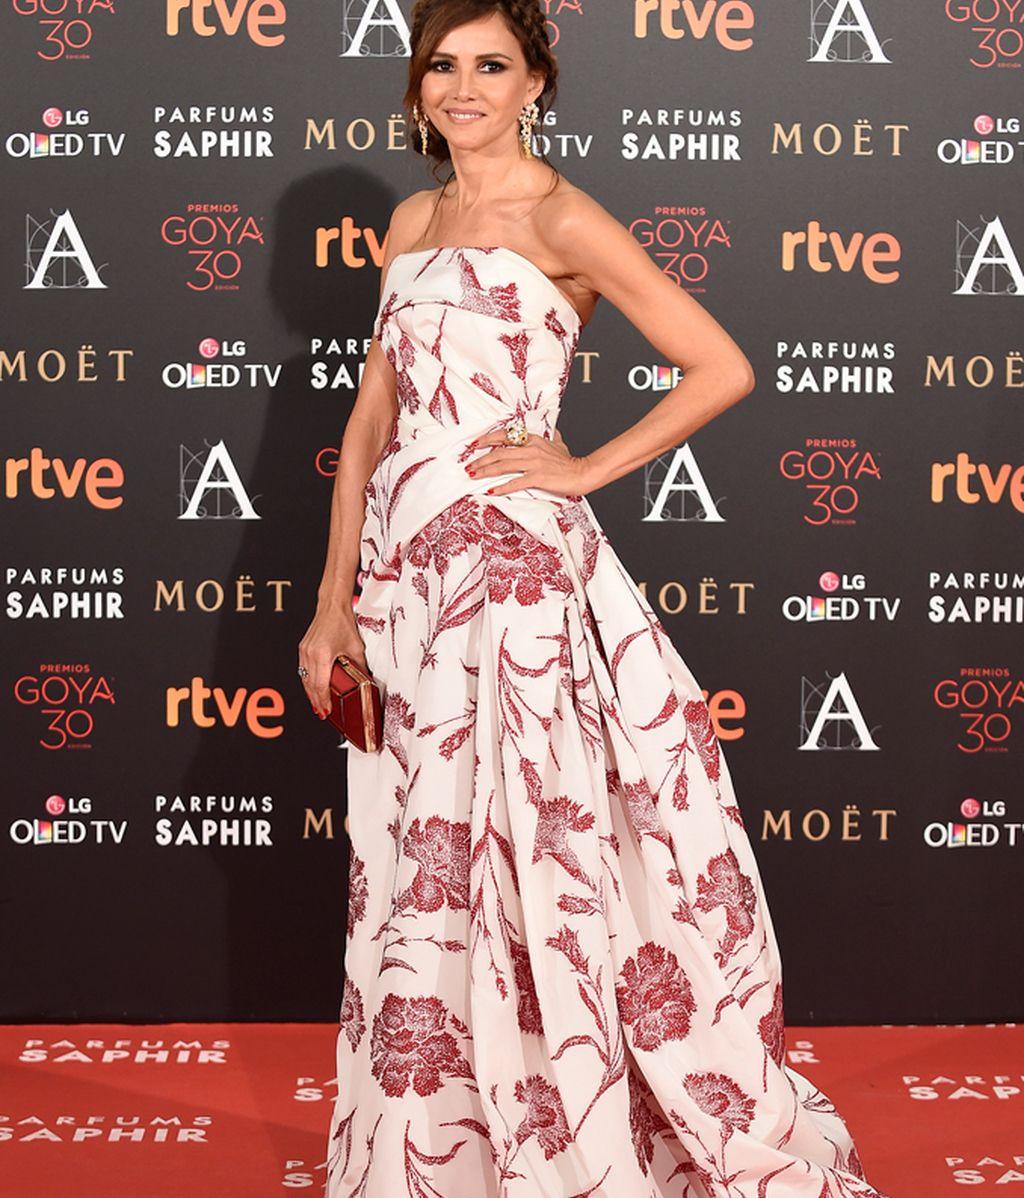 Goya Toledo con vestido de Carolina Herrera